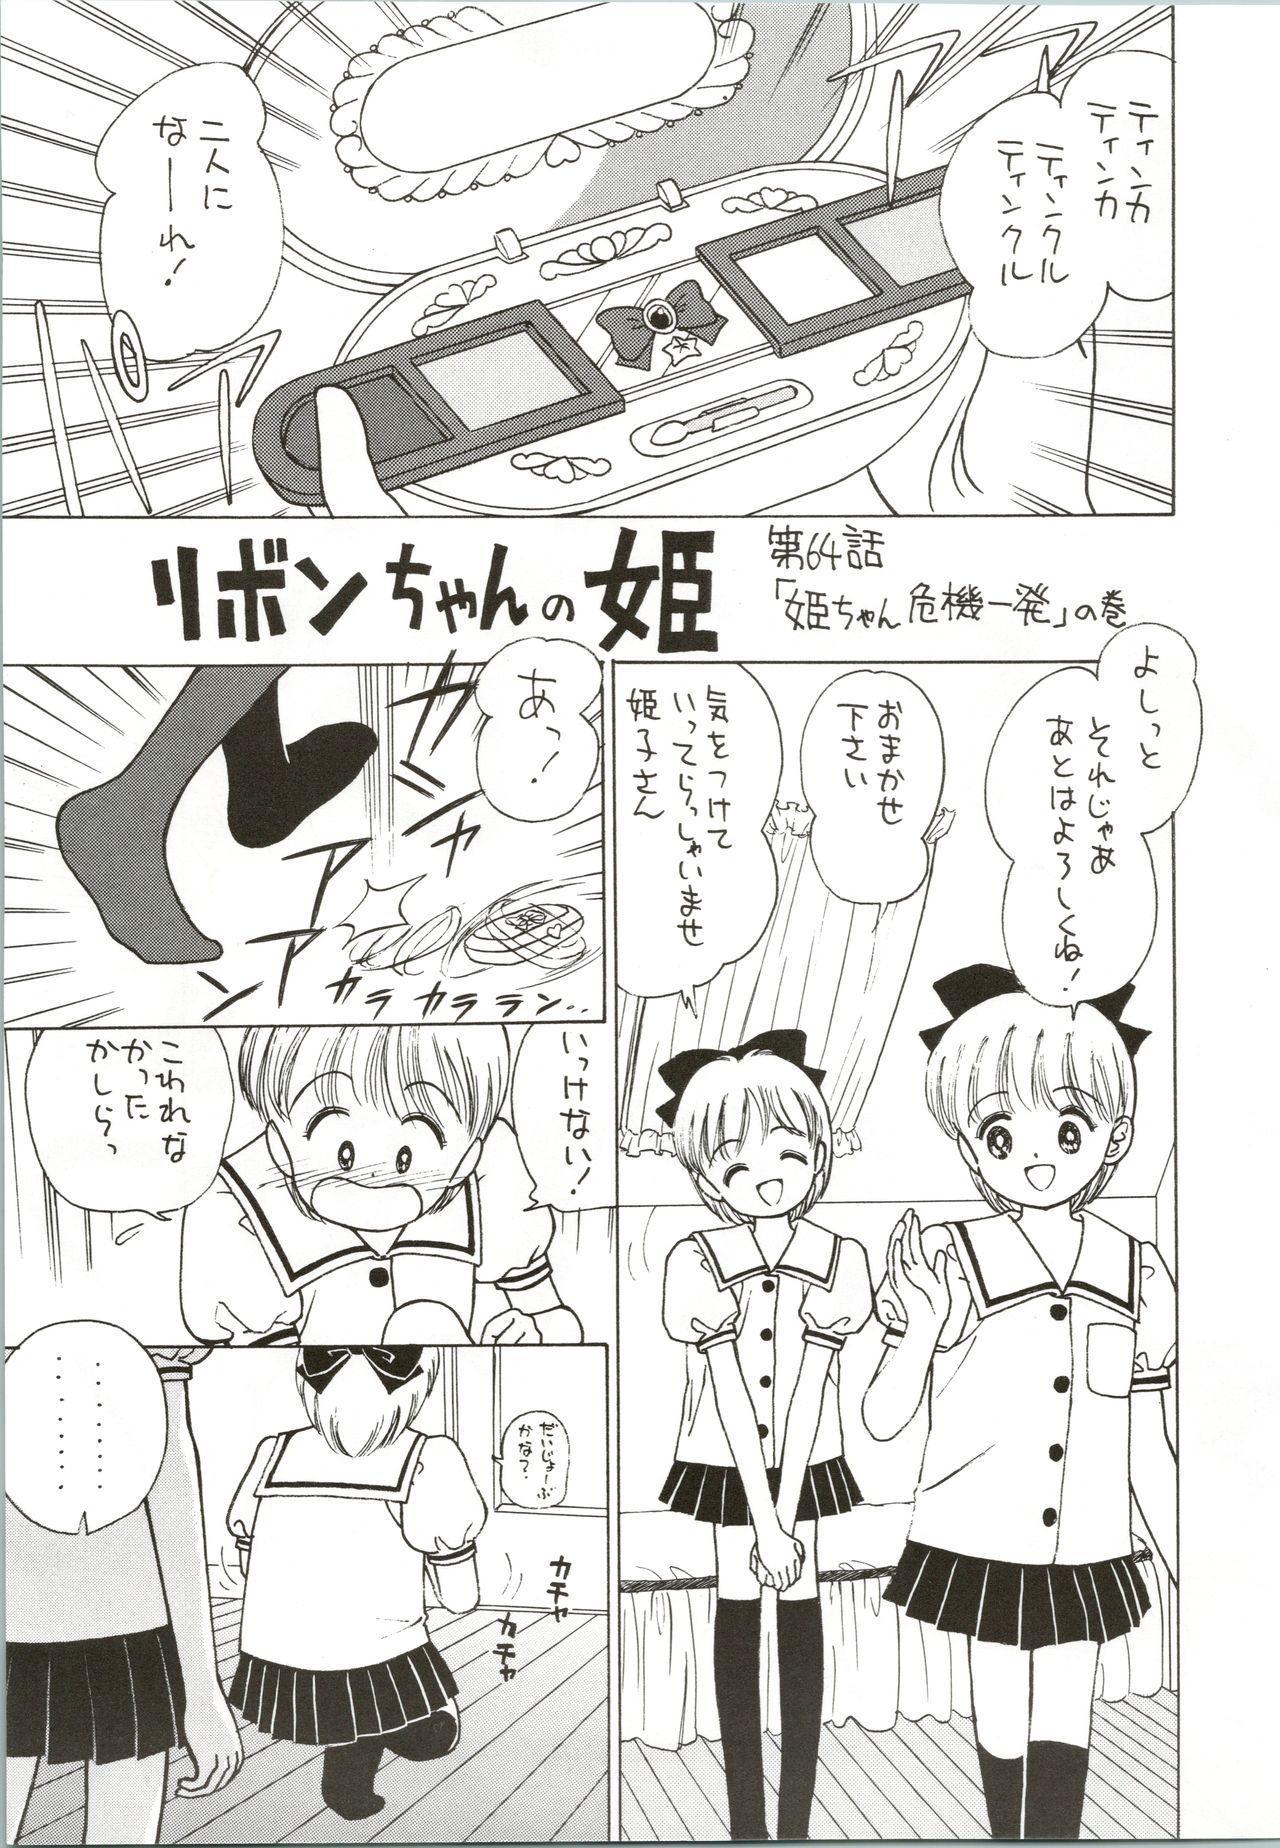 Hime-chan no Seifuku Special 4